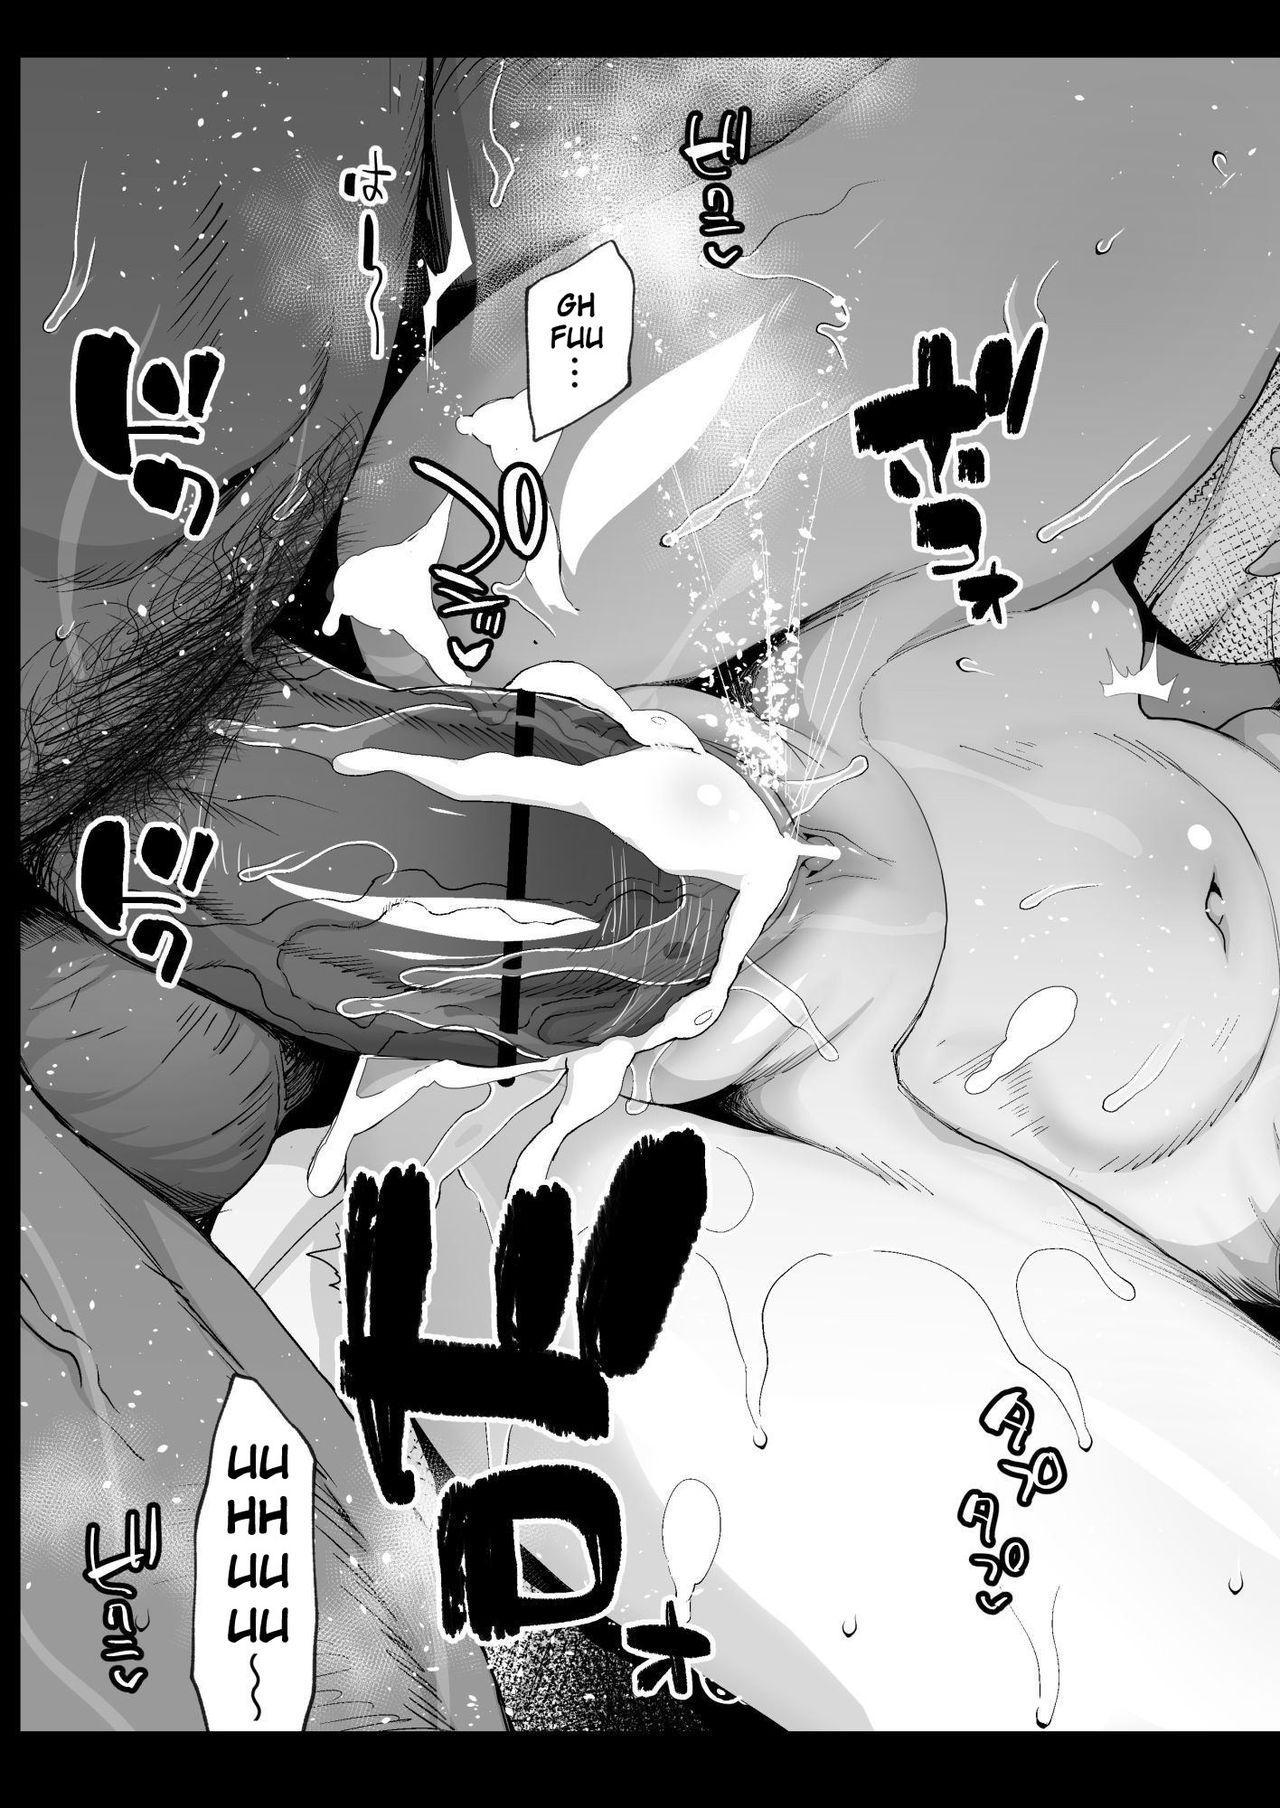 [Eromazun (Ma-kurou)] Kanao Muhyoujou Kan - RAPE OF DEMON SLAYER 3 | Rape of the Emotionless Kanao - Rape of Demon Slayer 3 (Kimetsu no Yaiba) [English] [Keye Necktire] [Digital] 26